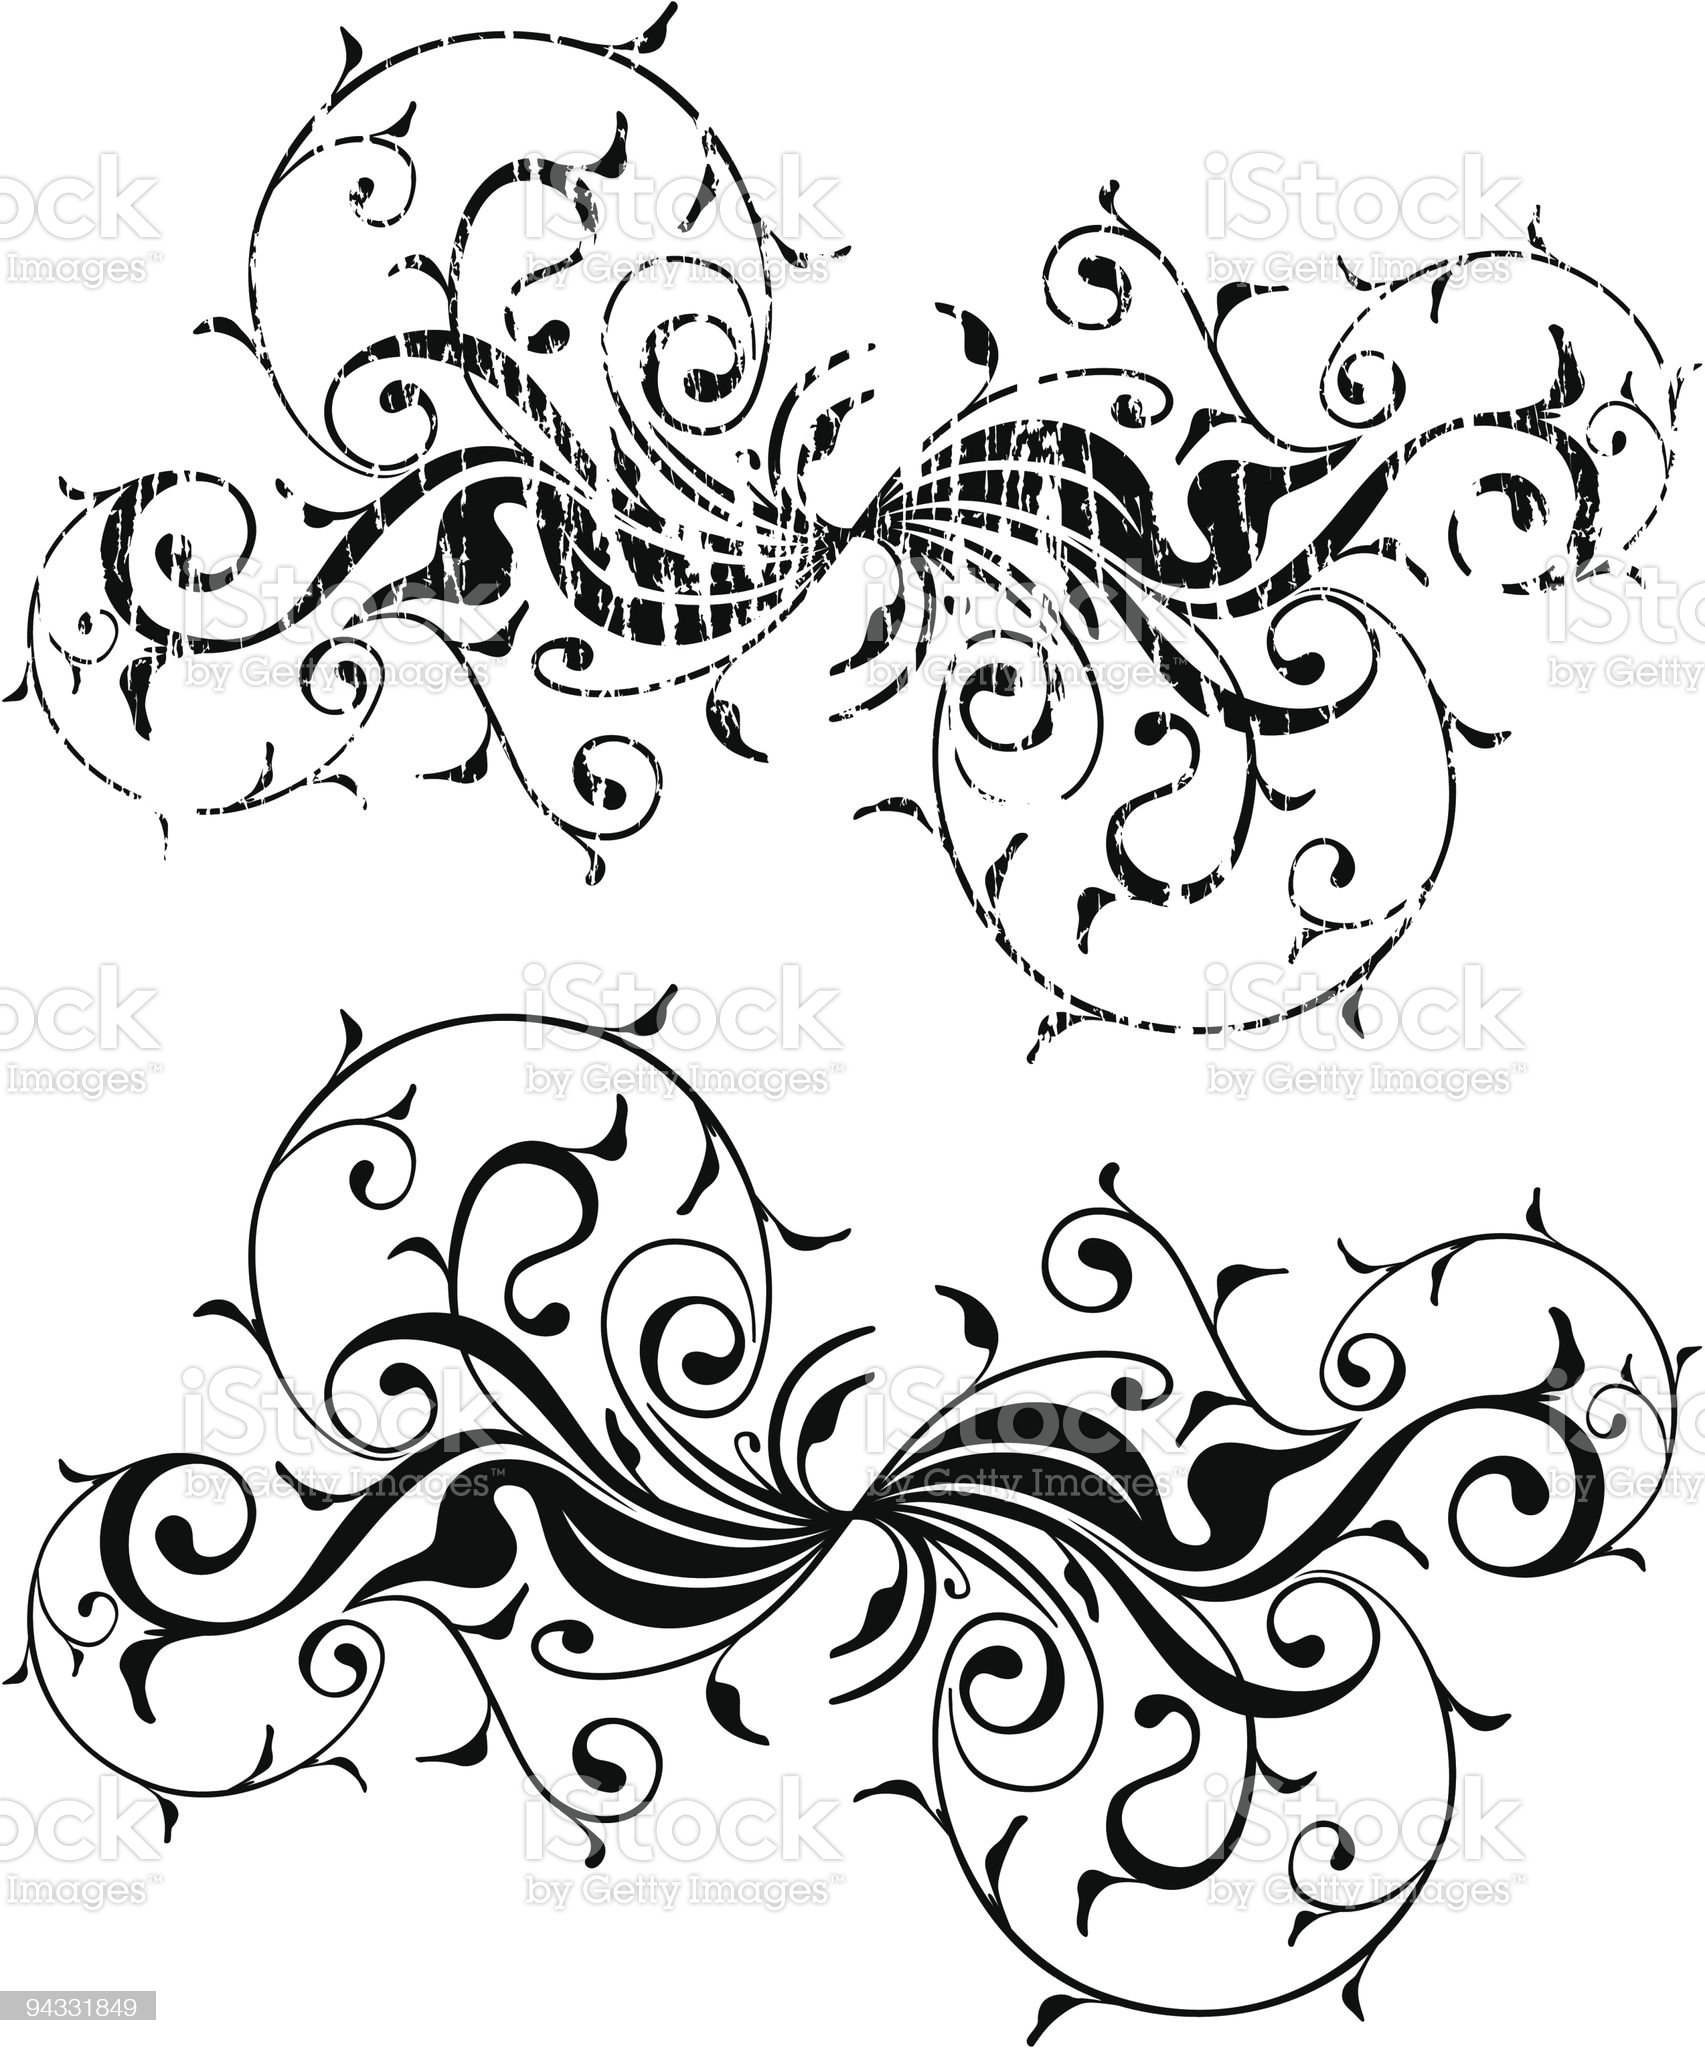 Grunge Scroll 04 royalty-free stock vector art